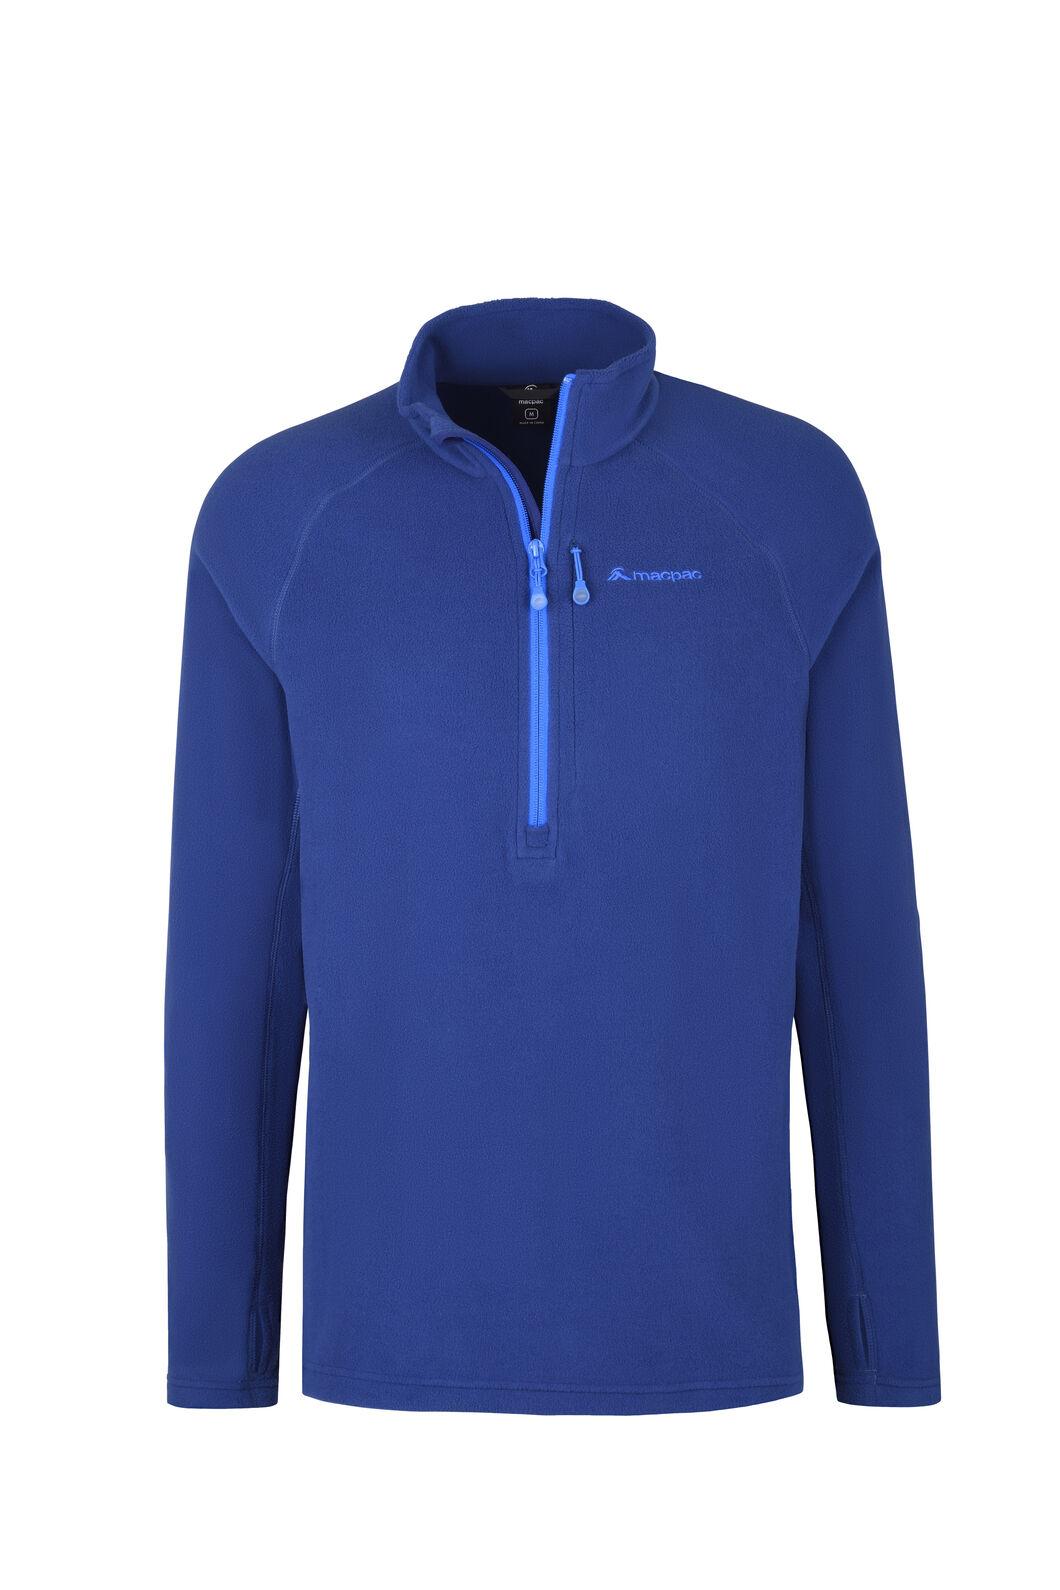 Macpac Tui Fleece Pullover - Men's, Blue Depths, hi-res